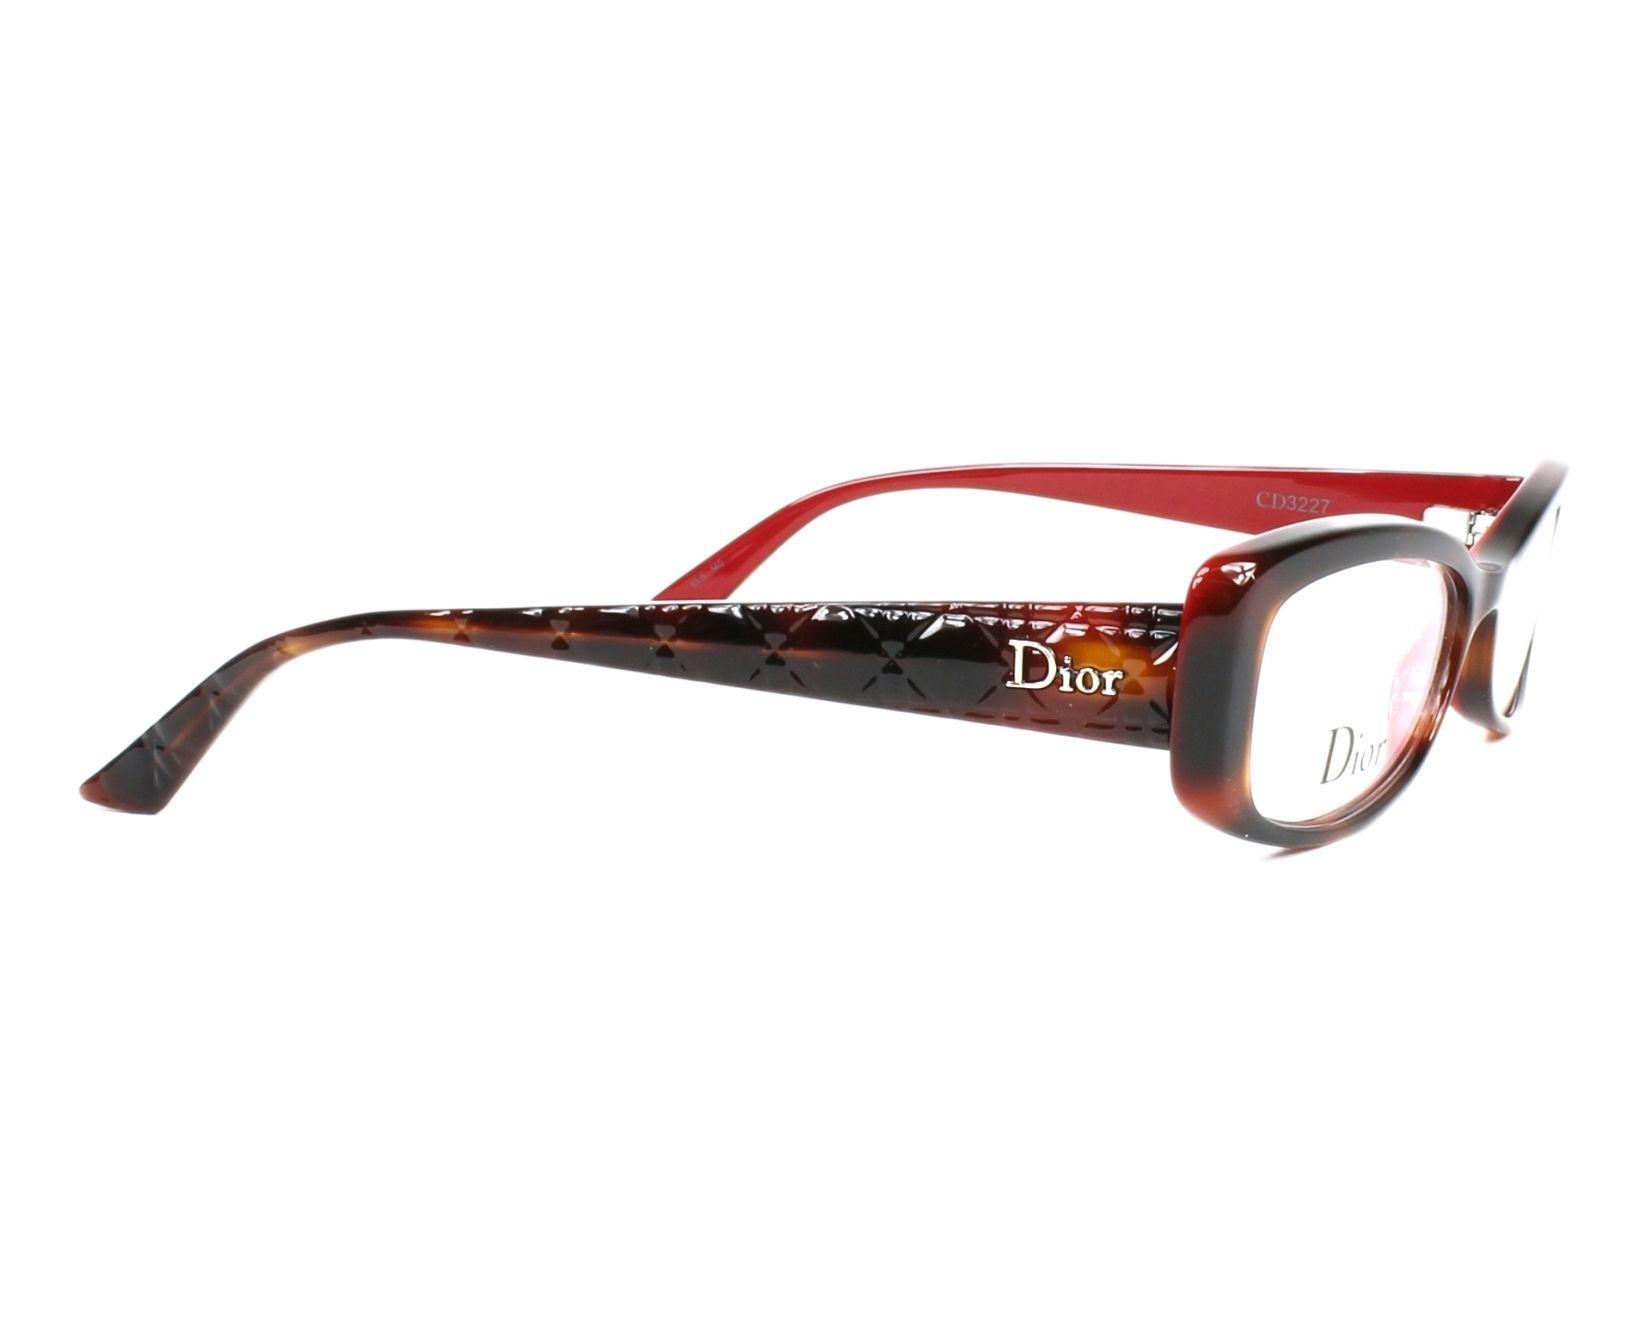 040905efb1 New Christian Dior Eyeglasses Cd 3233